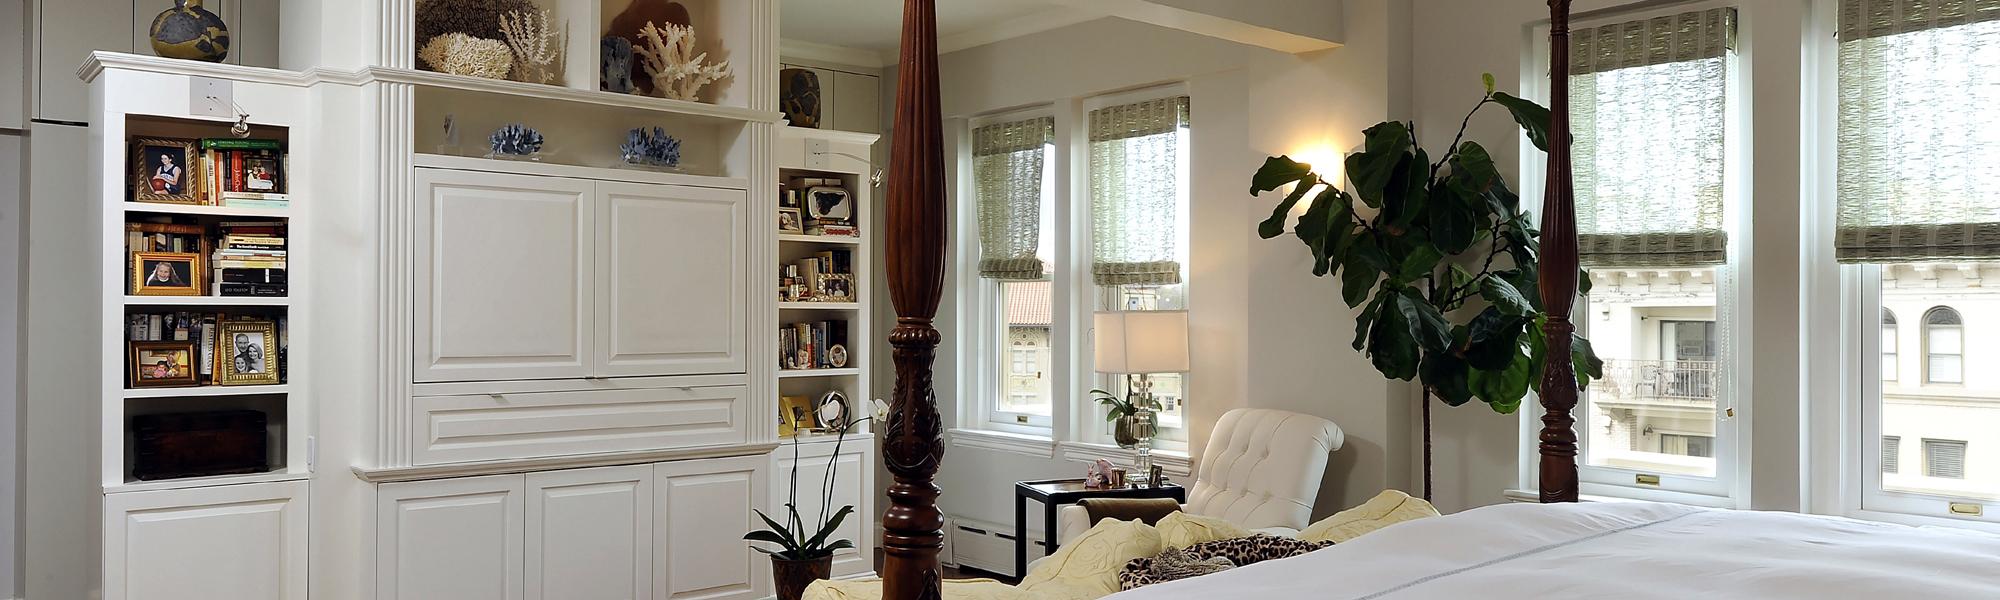 Washington DC Condo Renovation Master Bedroom Storage